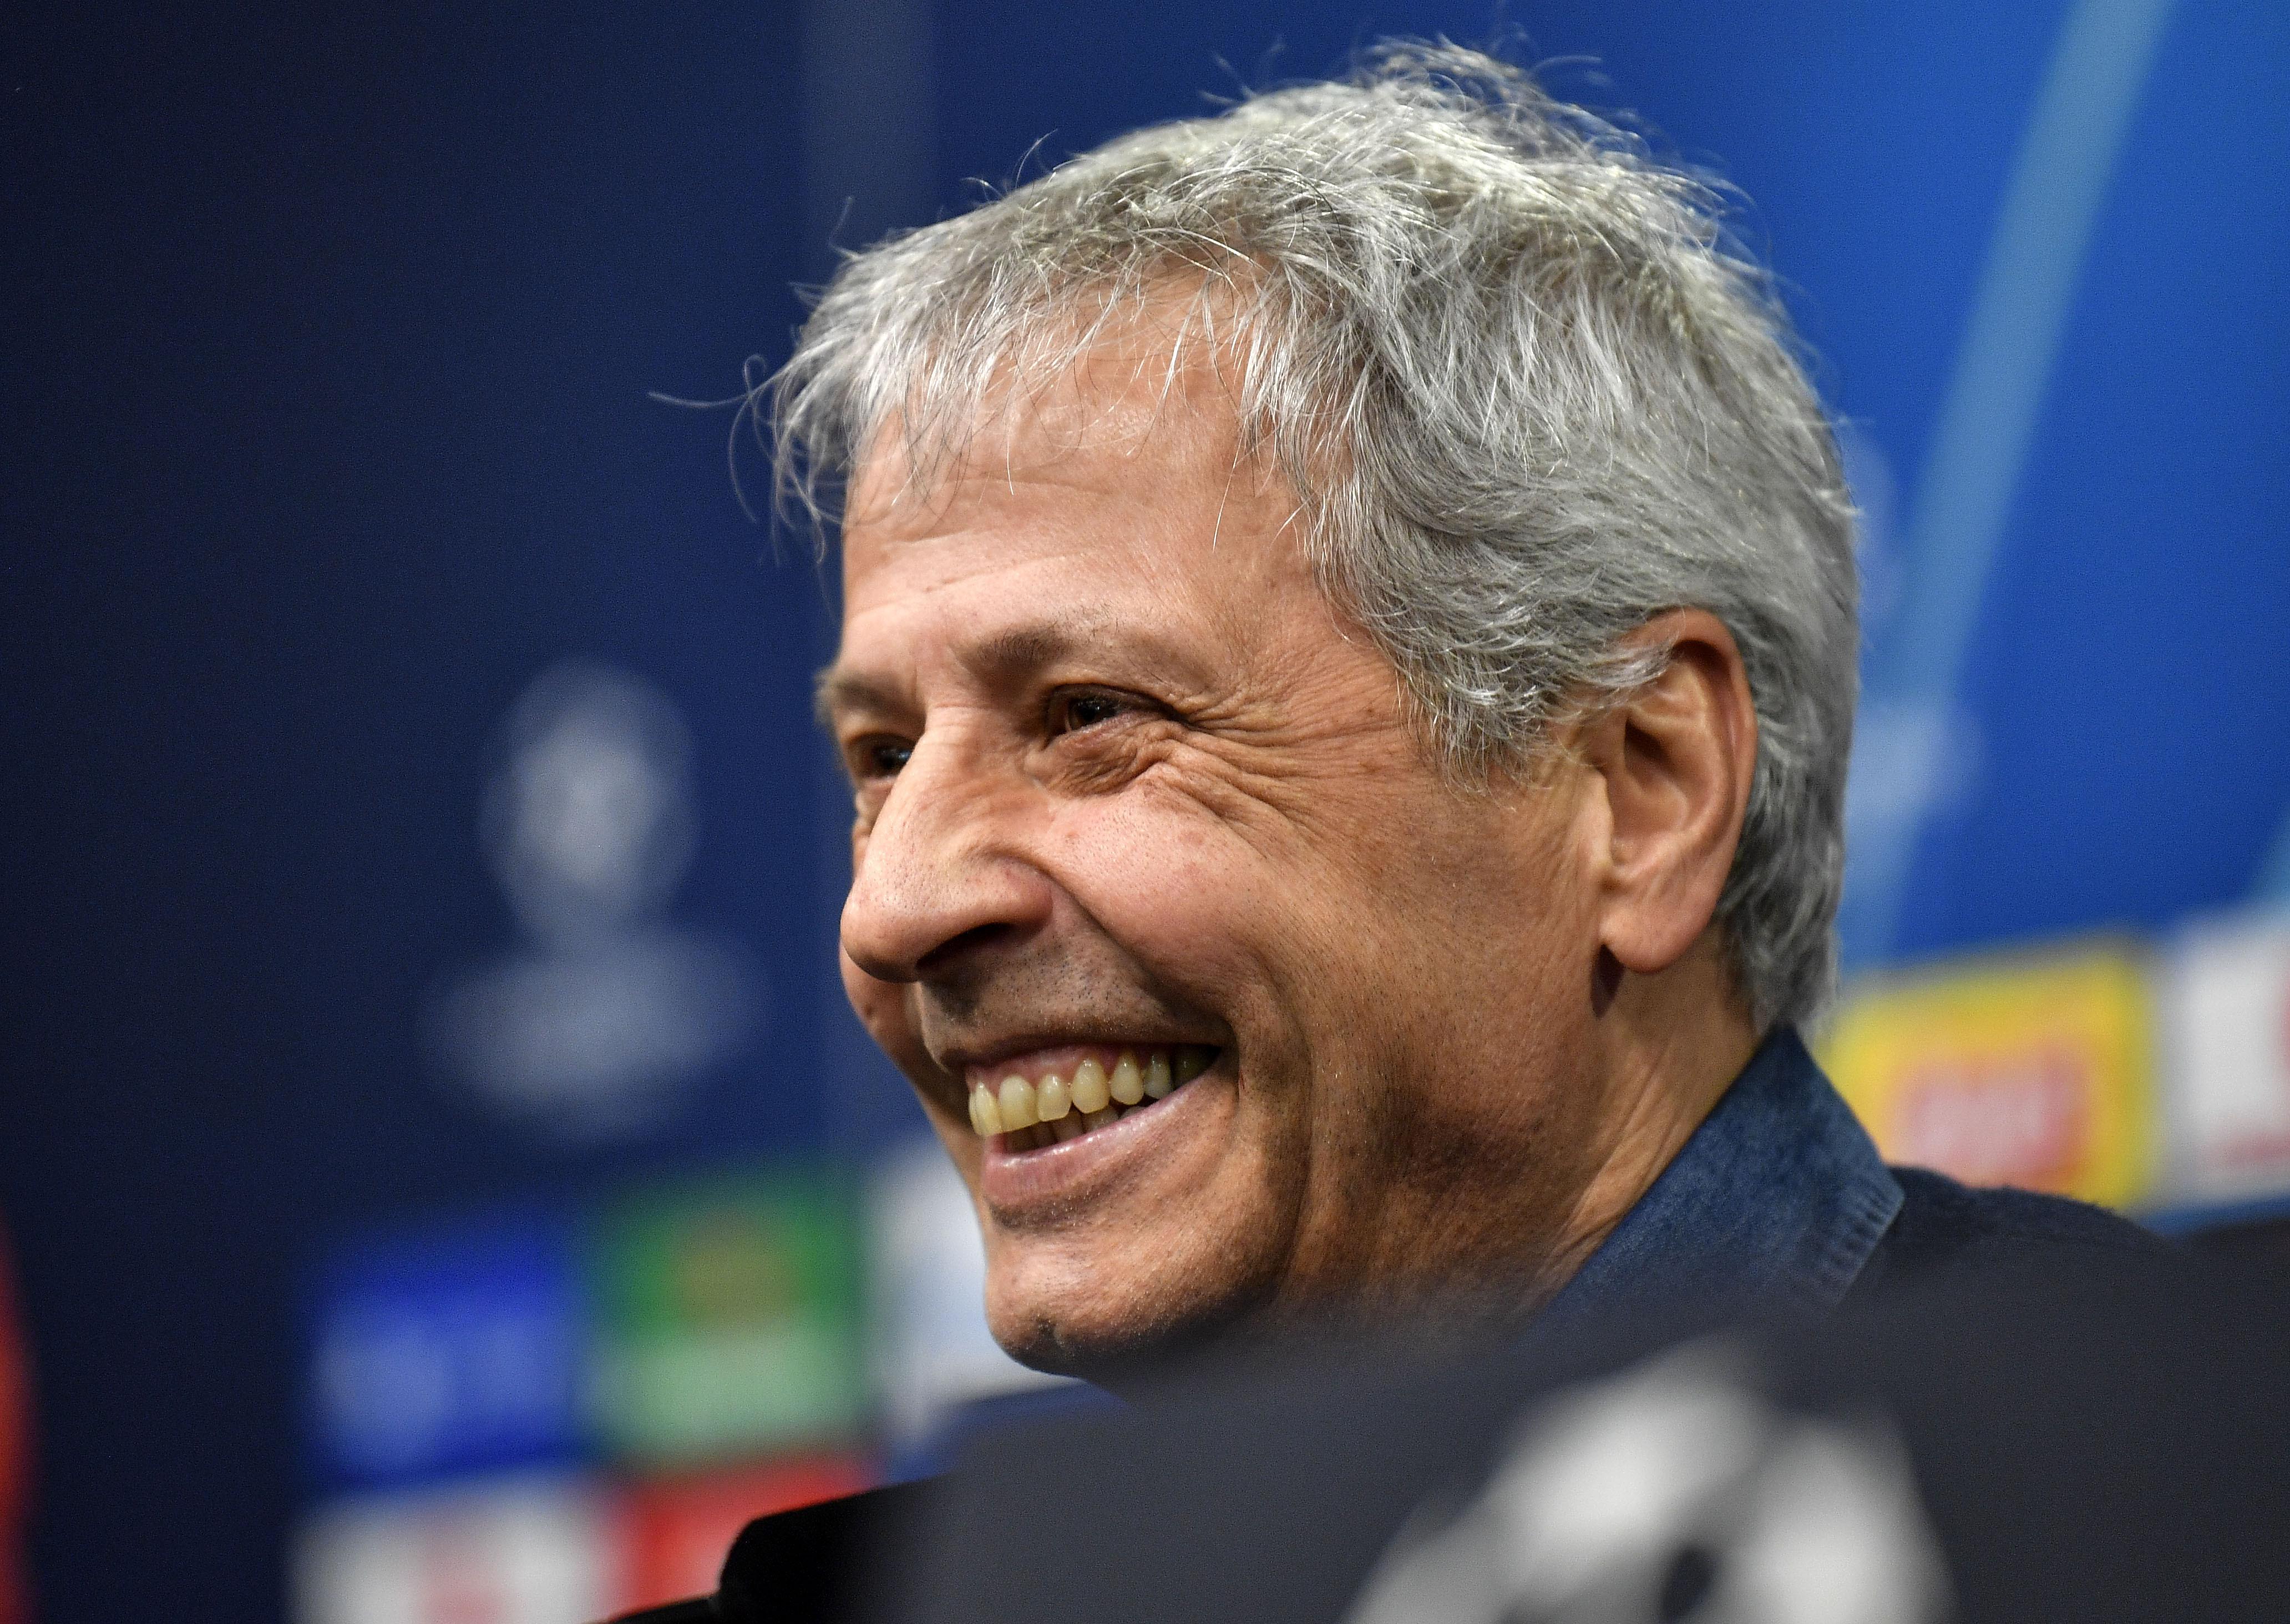 Neymar to return for PSG against Dortmund, says coach